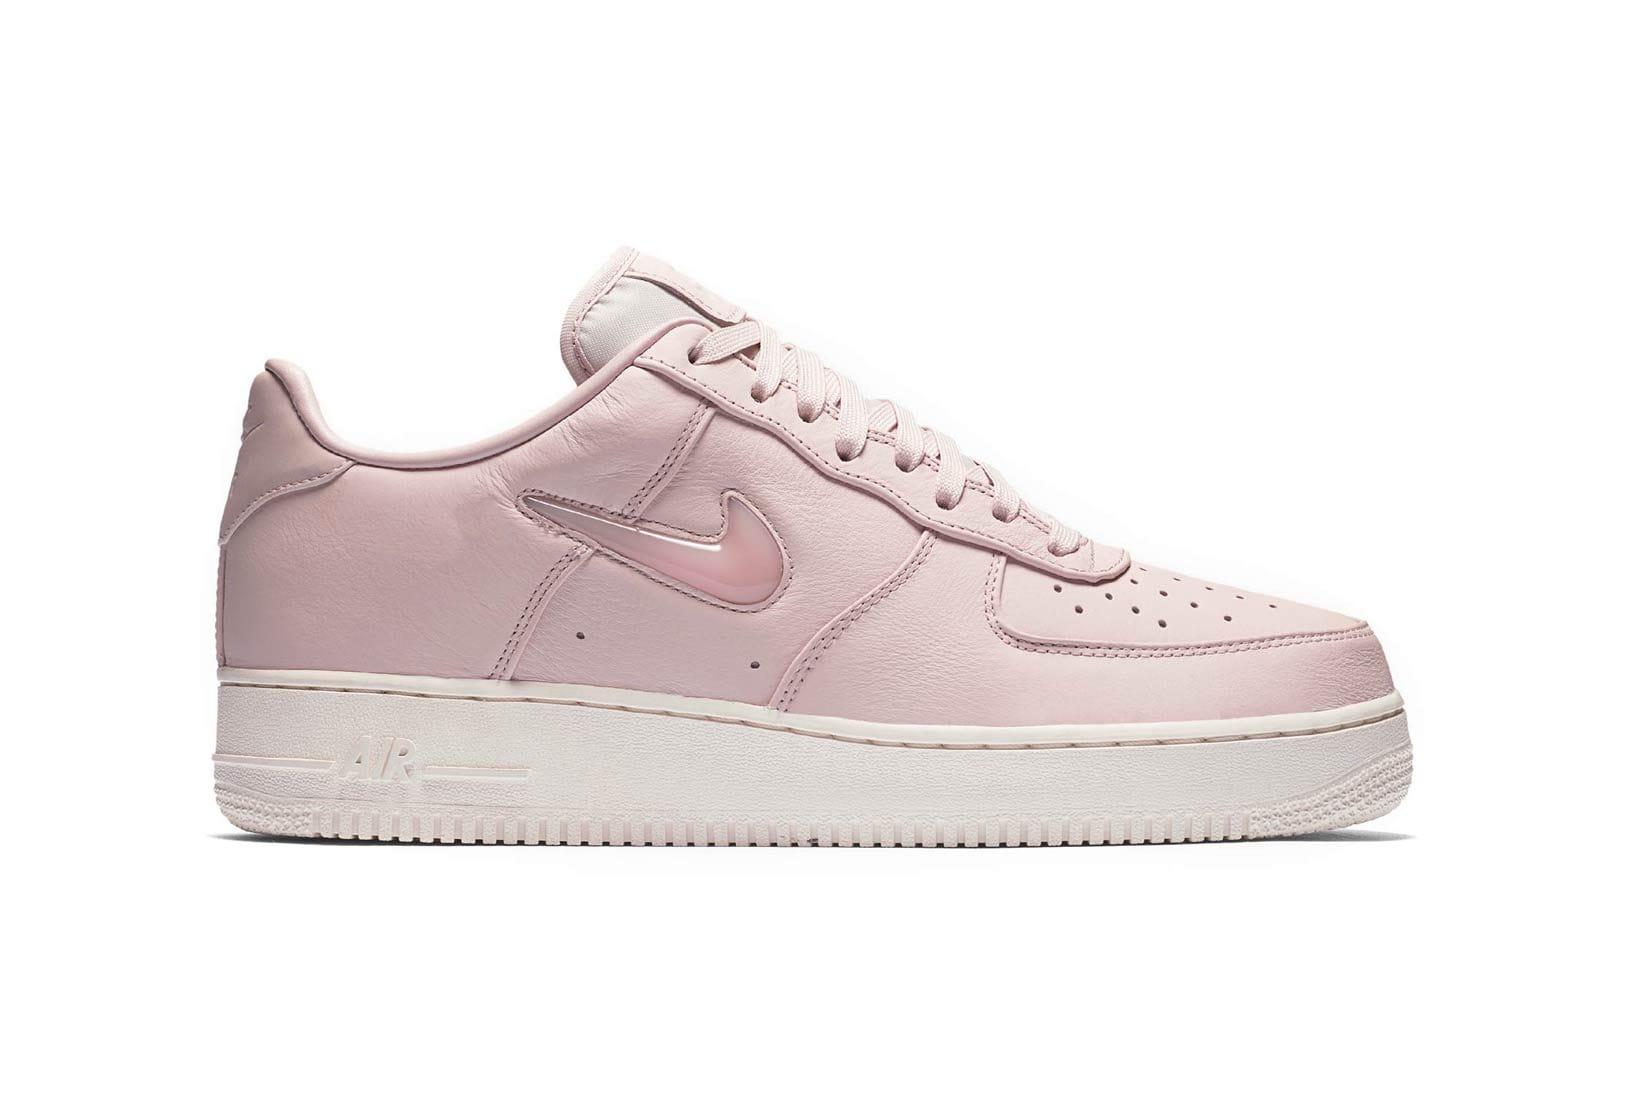 Nike Air Force 1 Jewel Pearl Pink Drops